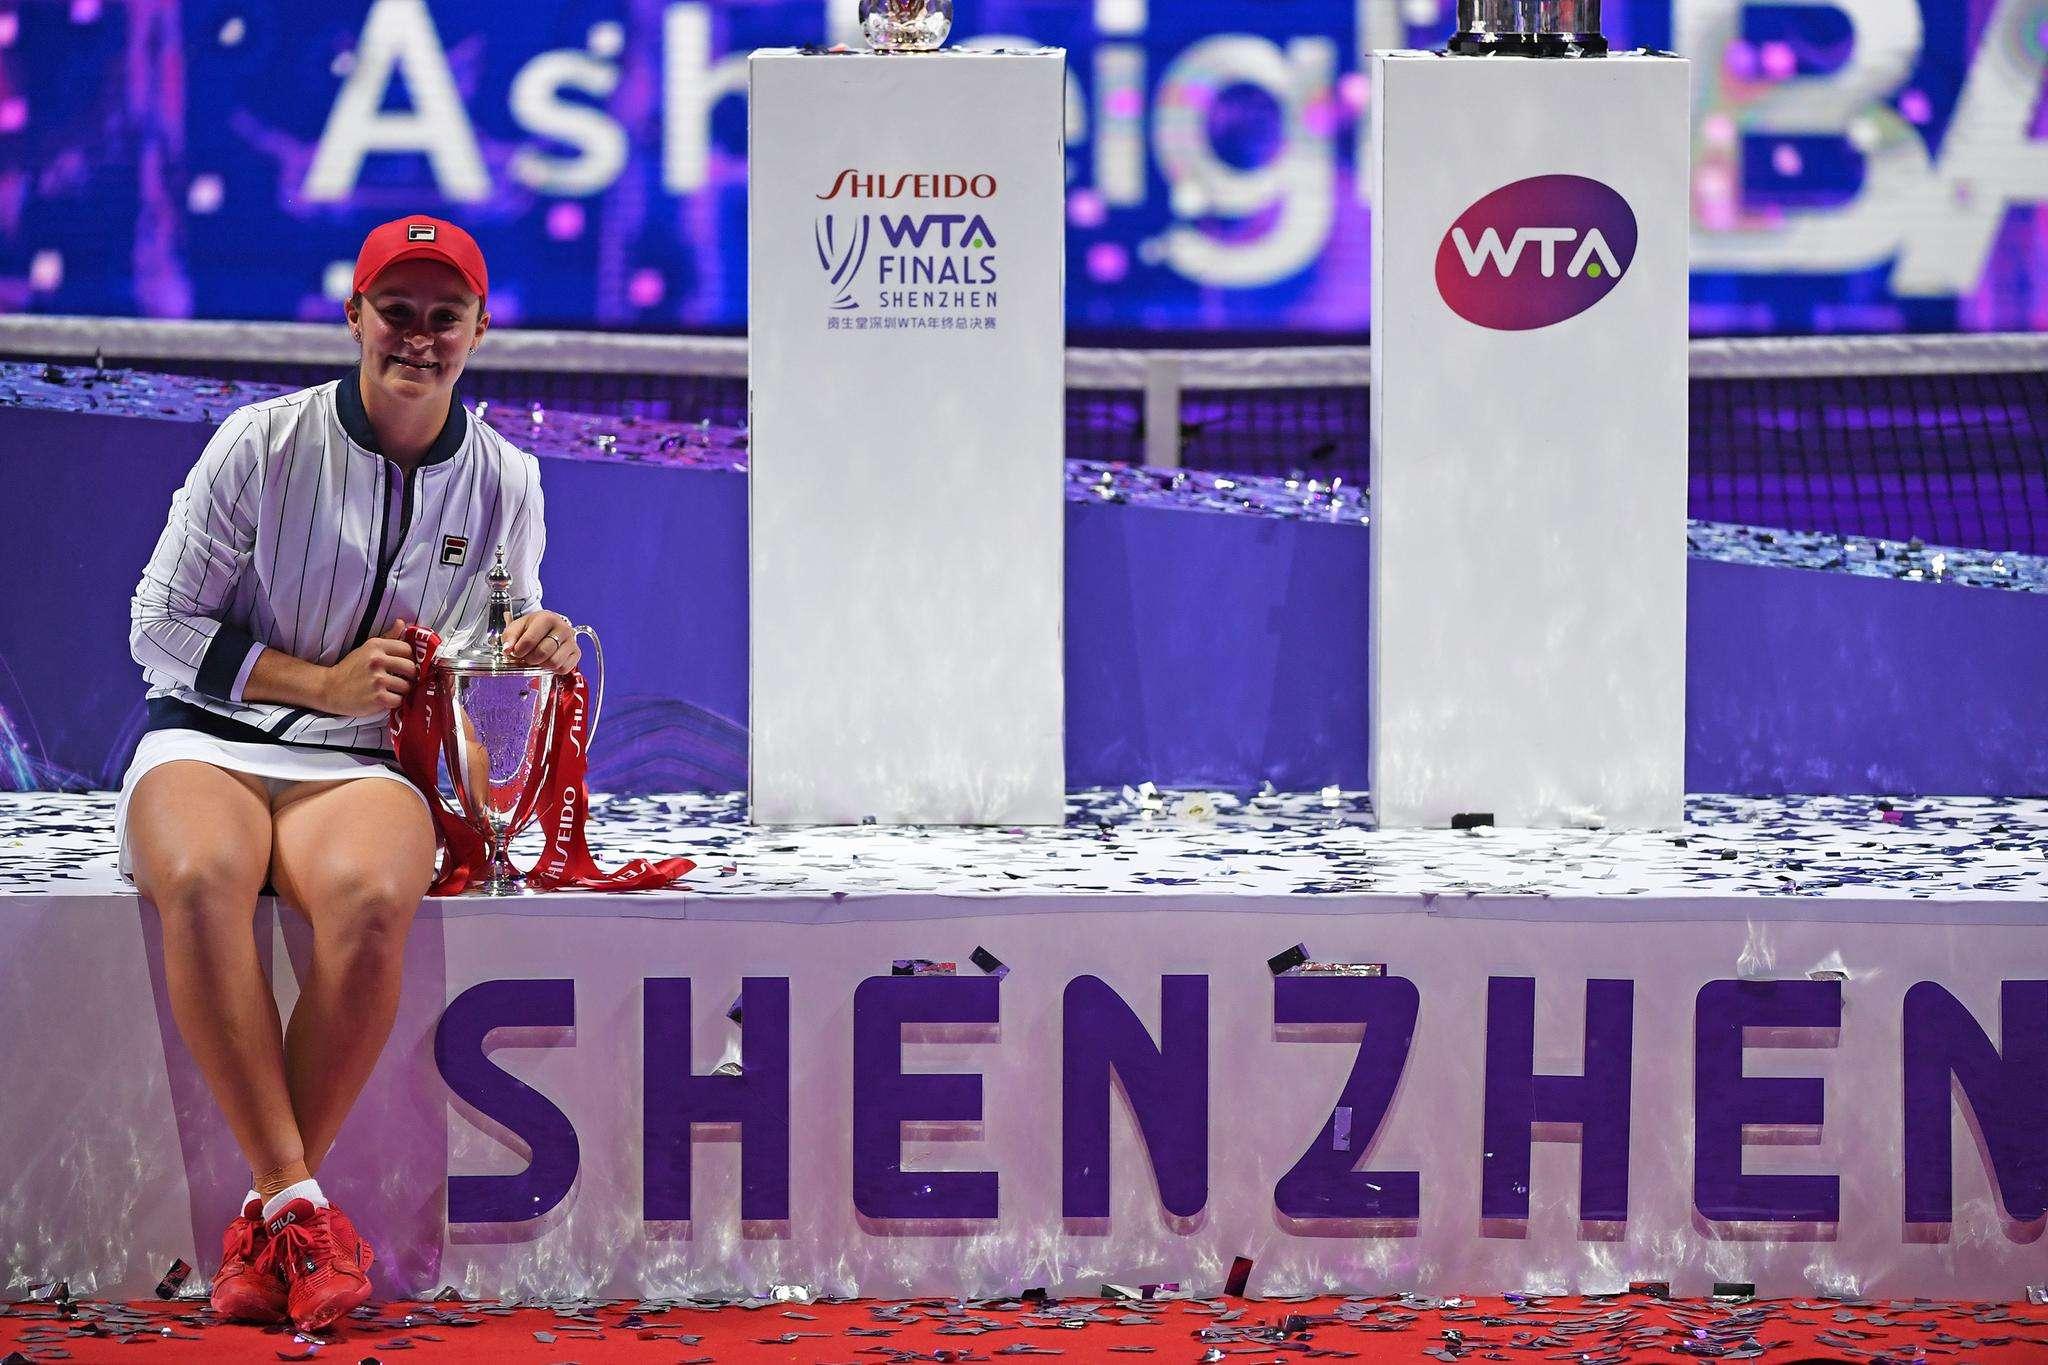 WTA即将取消2020中国赛季,预计明天官宣